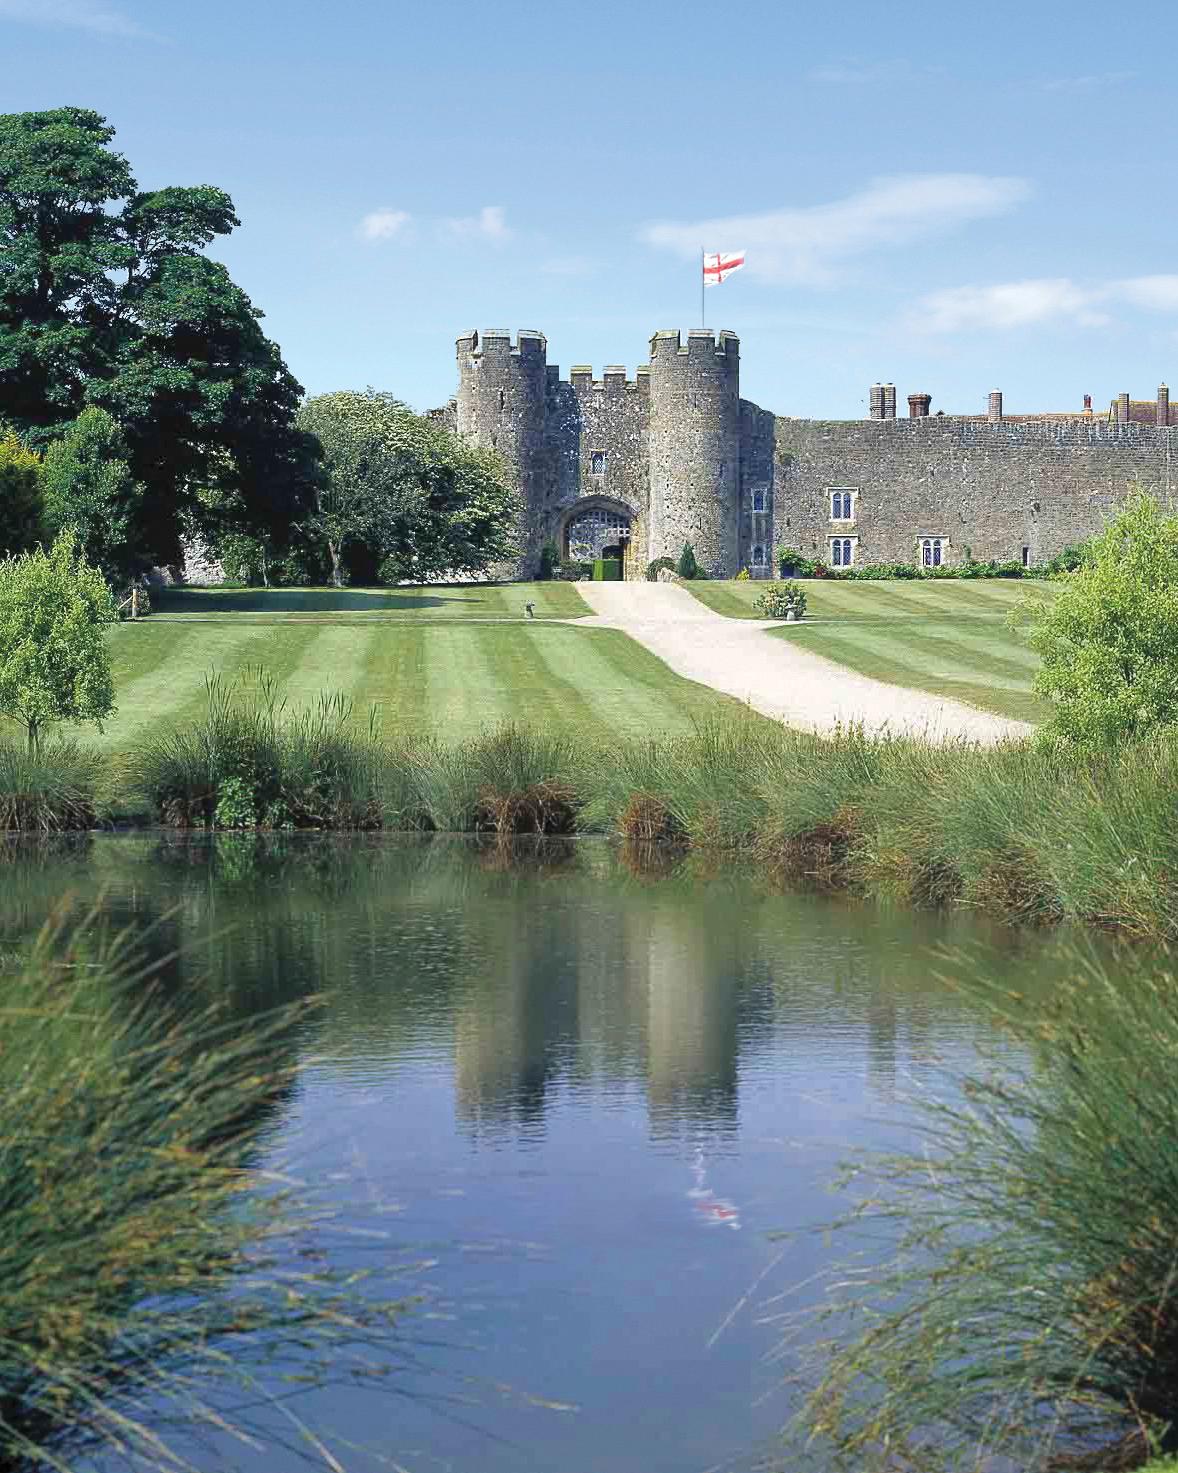 smith-amberley-castle-west-sussex-uk.jpg